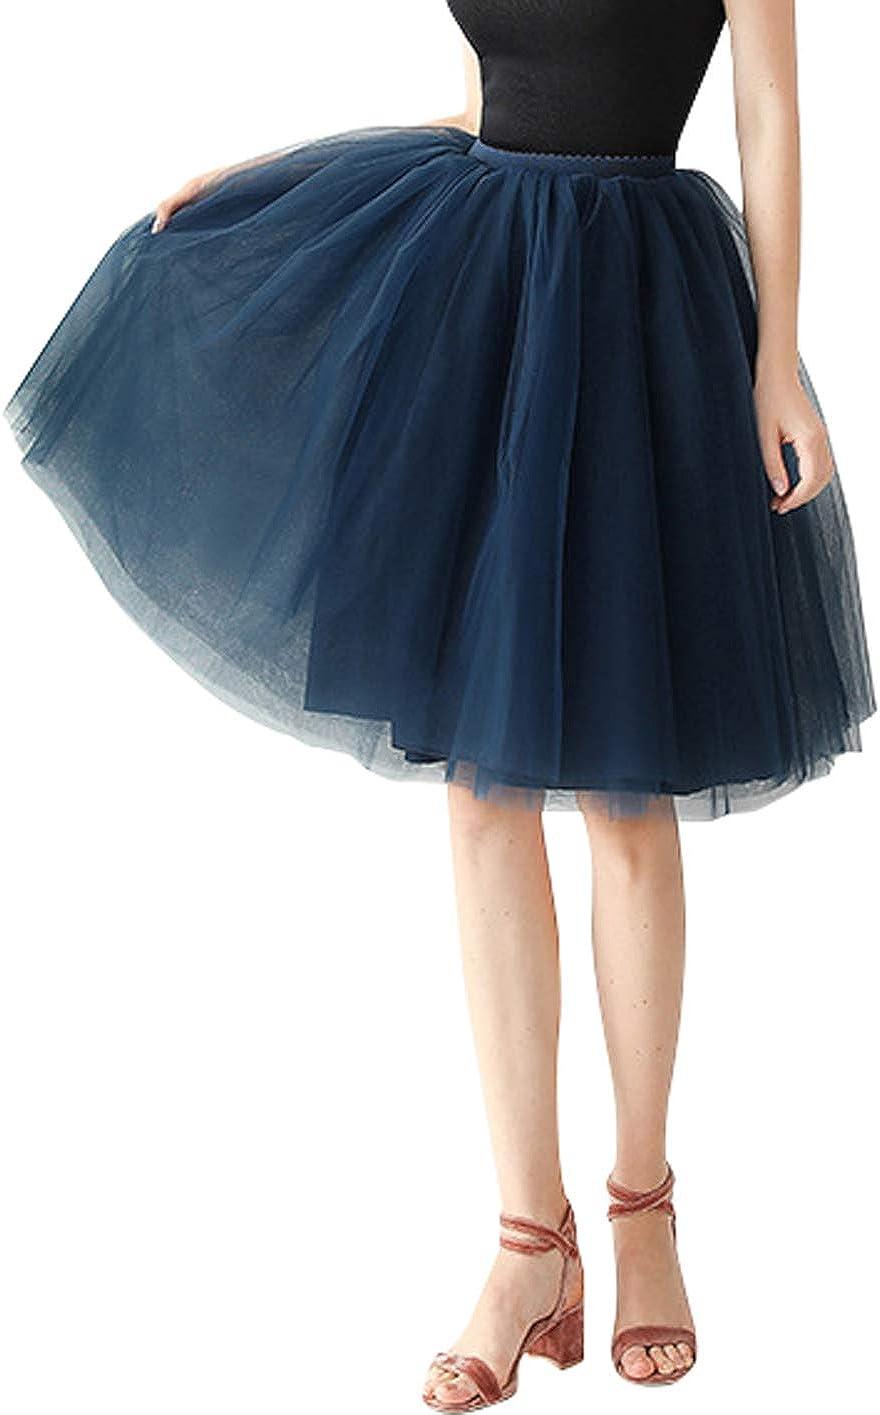 CHARTOU Womens Elastic-Waist A-Line Knee Length 7-Layer Maxi Tutu Tulle Petticoat Skirt